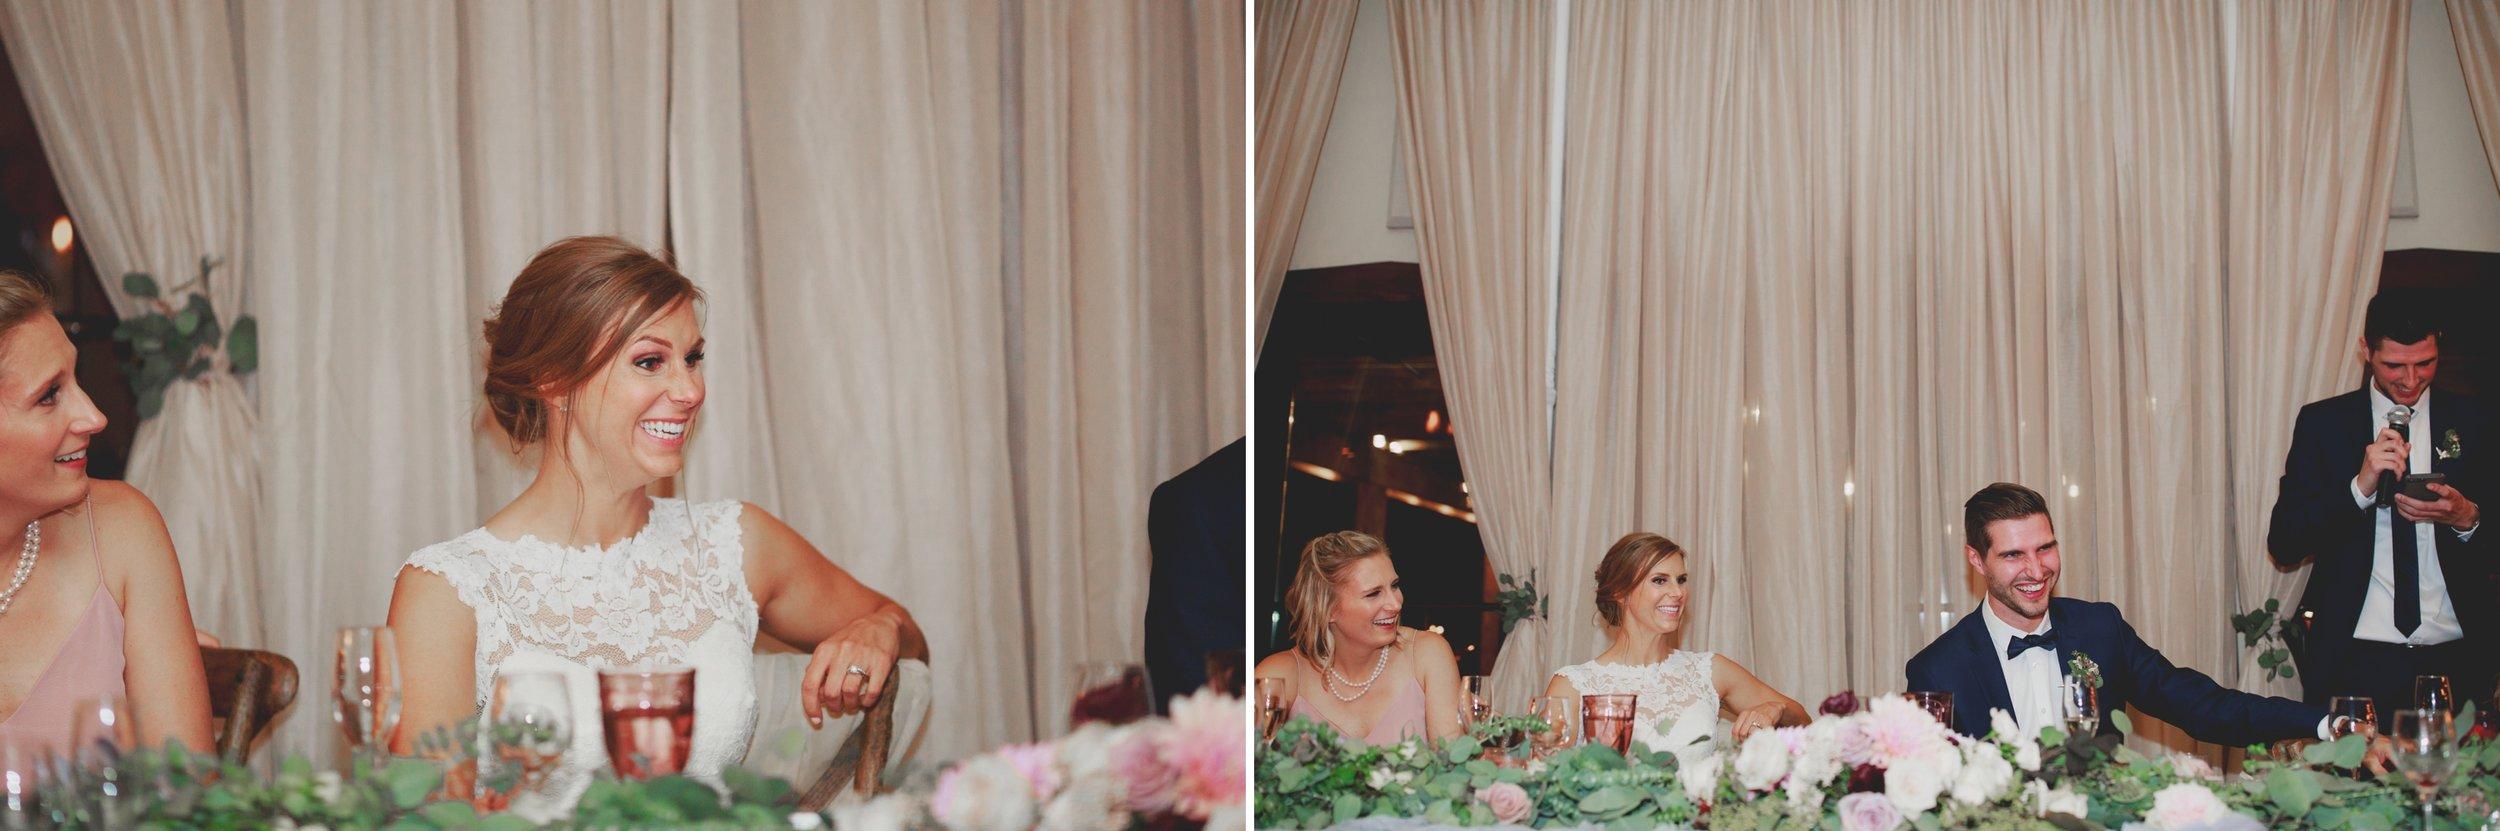 traverse_city_wedding_157.jpg